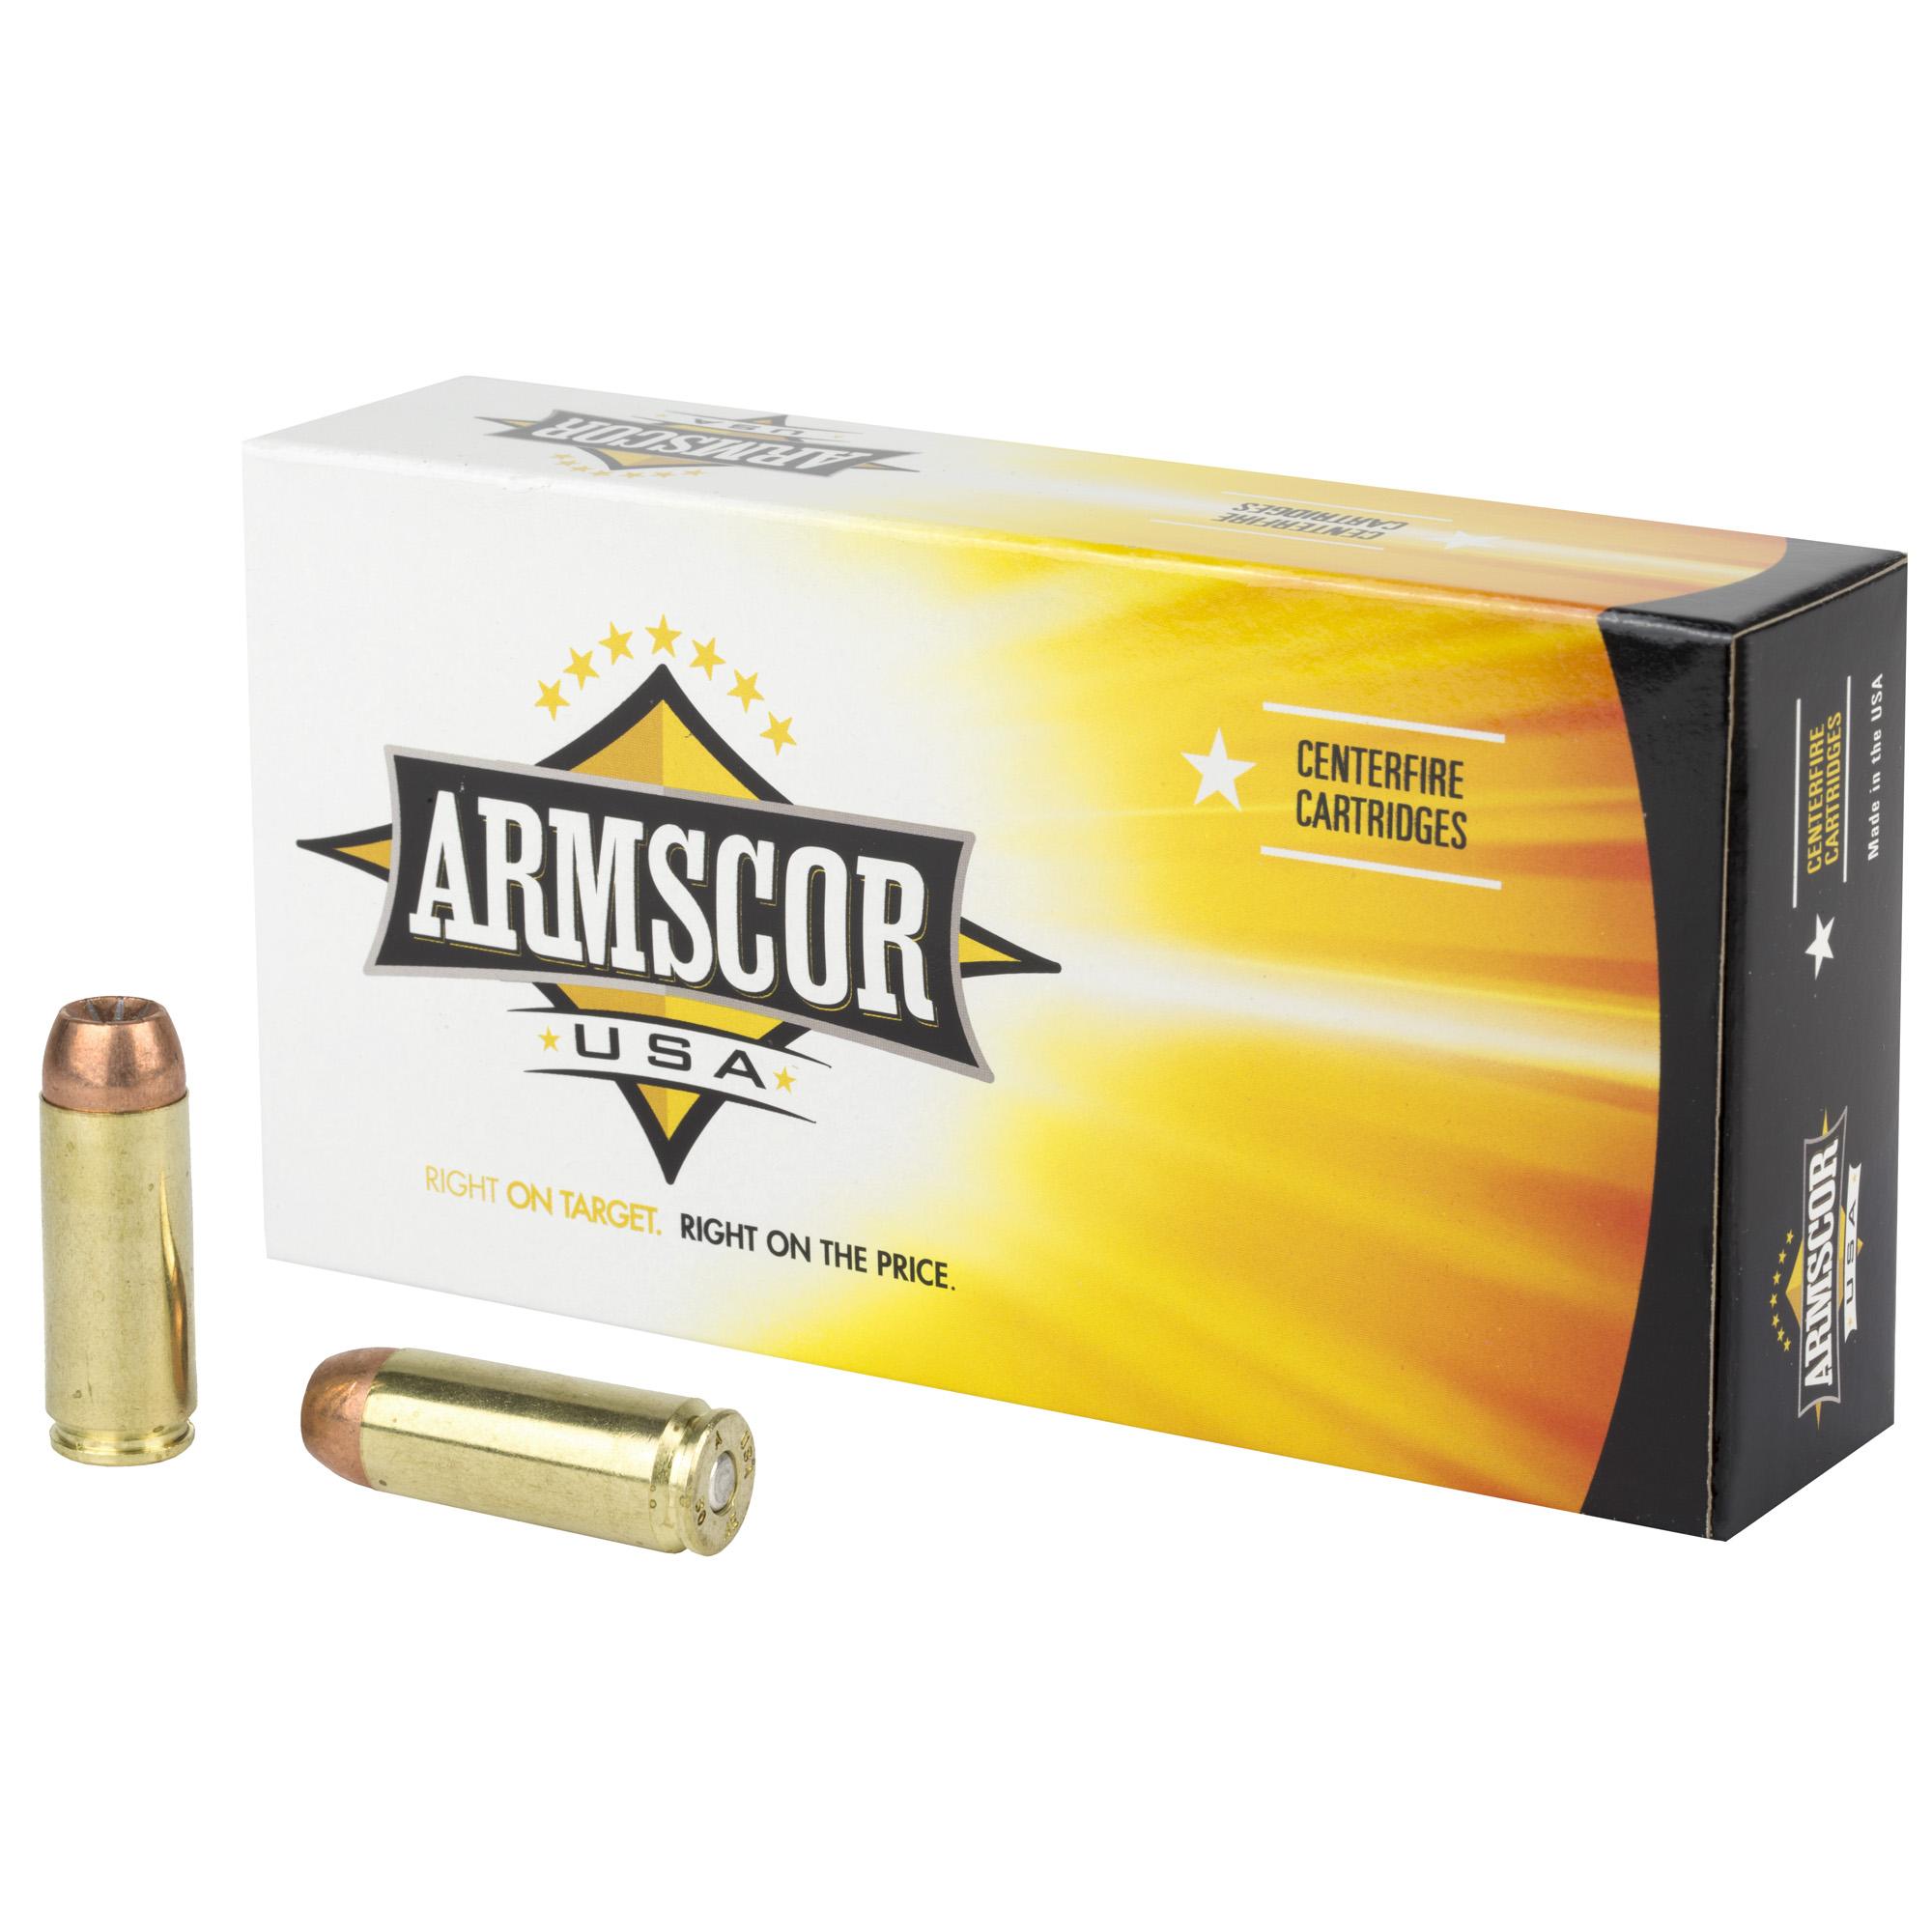 Armscor 50ae 300gr Jhp 20/400